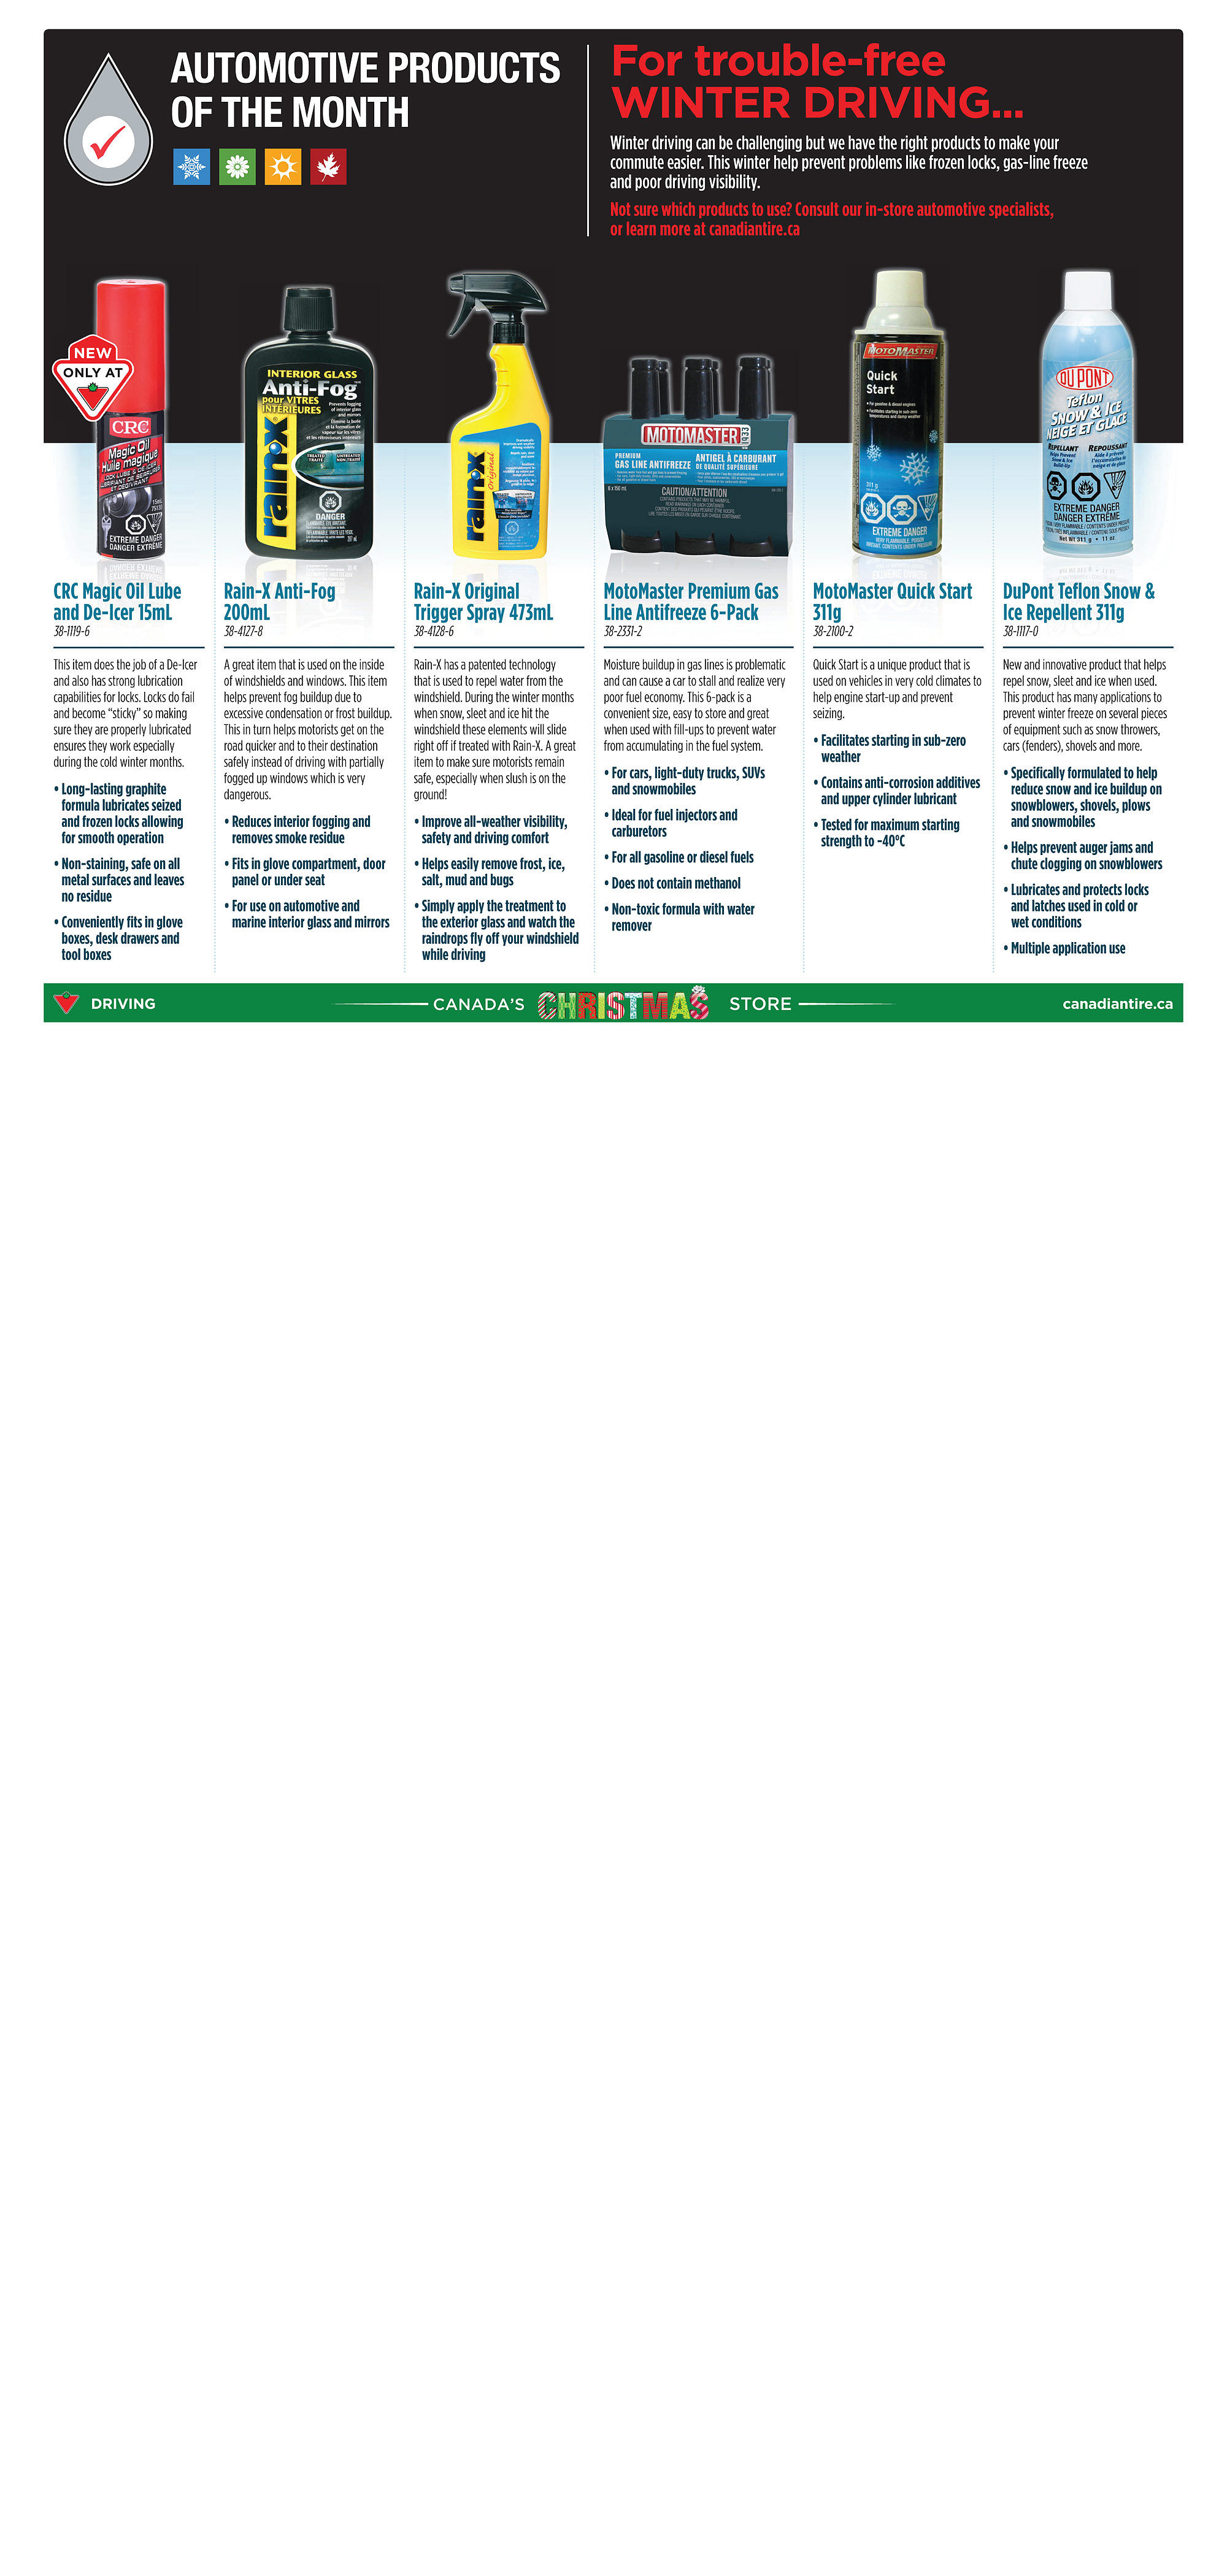 Canadian Tire Weekly Flyer - Weekly Flyer - Dec 5 – 12 ...